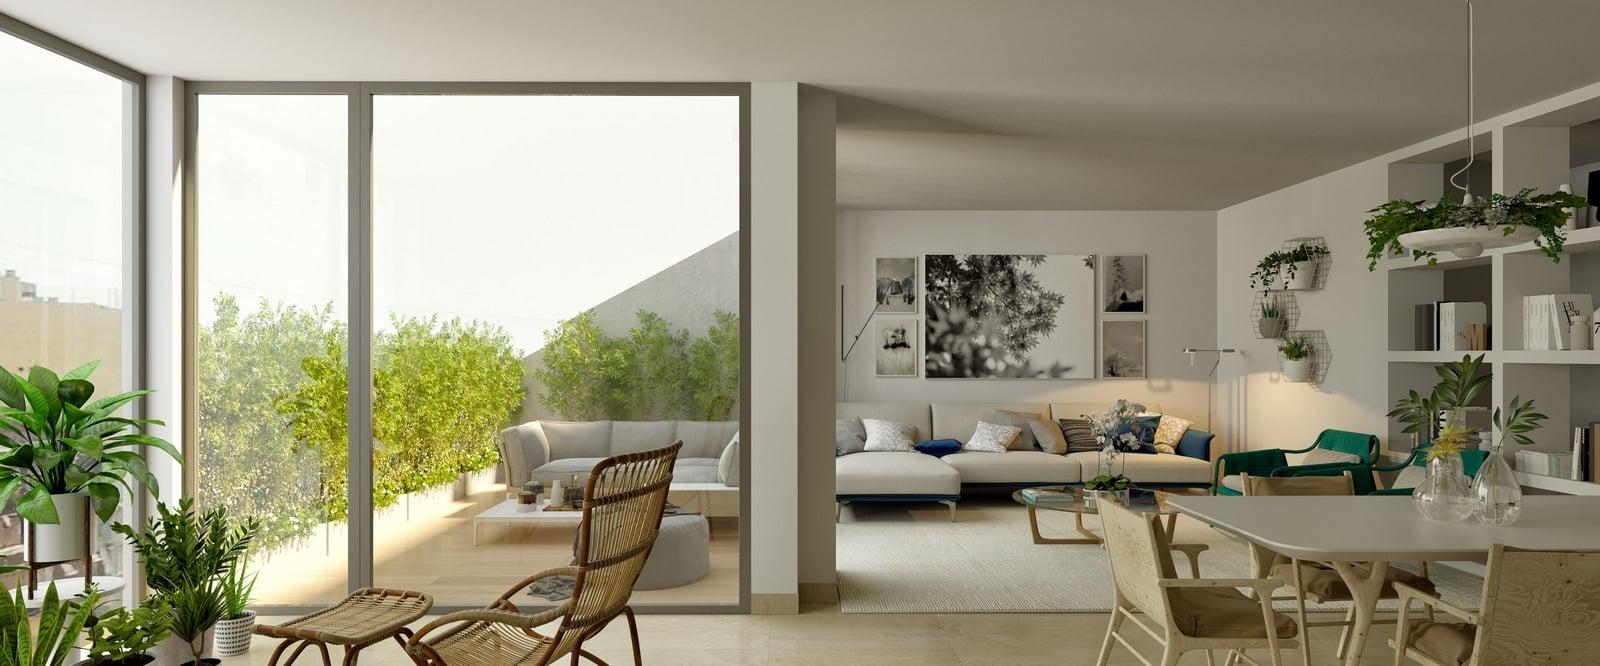 NC1140QU : Апартаменты класса люкс в центре Аликанте, Коста Бланка Cевер